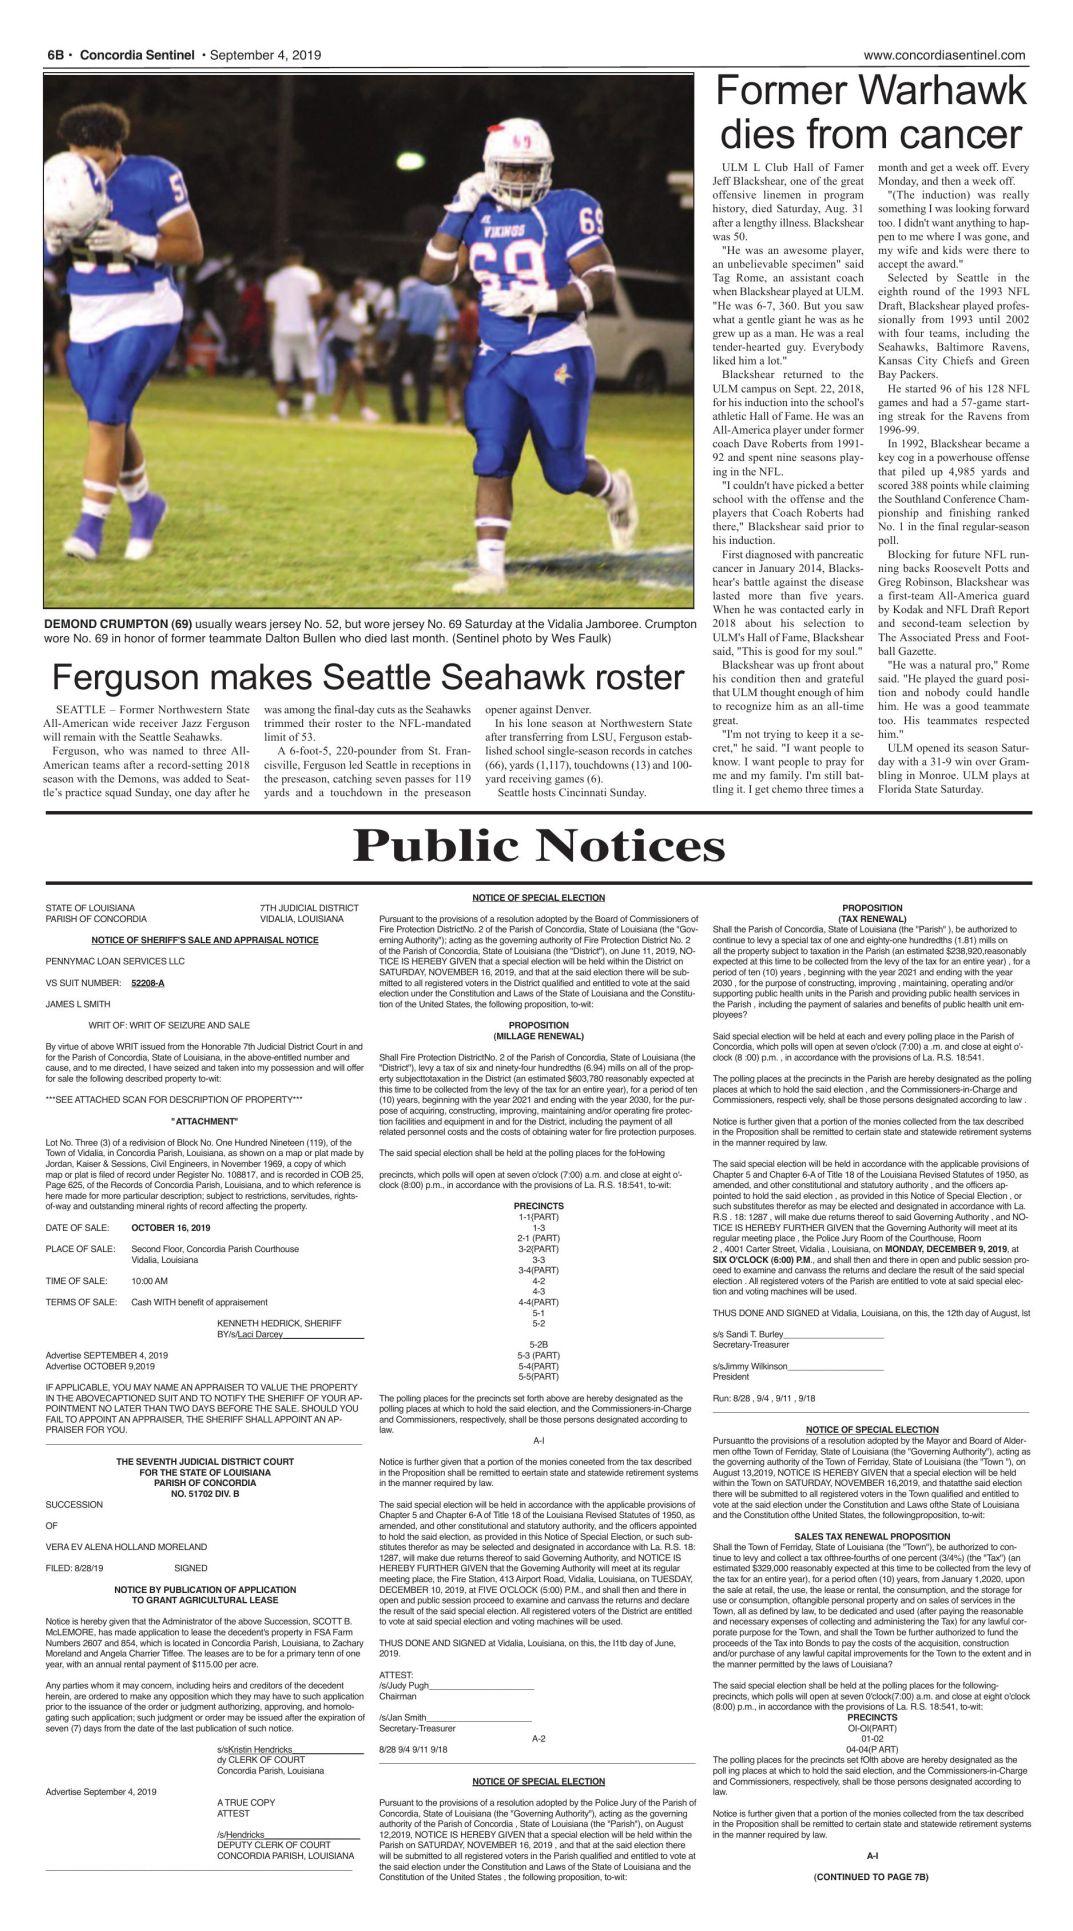 Public Notices - Sept. 4, 2019